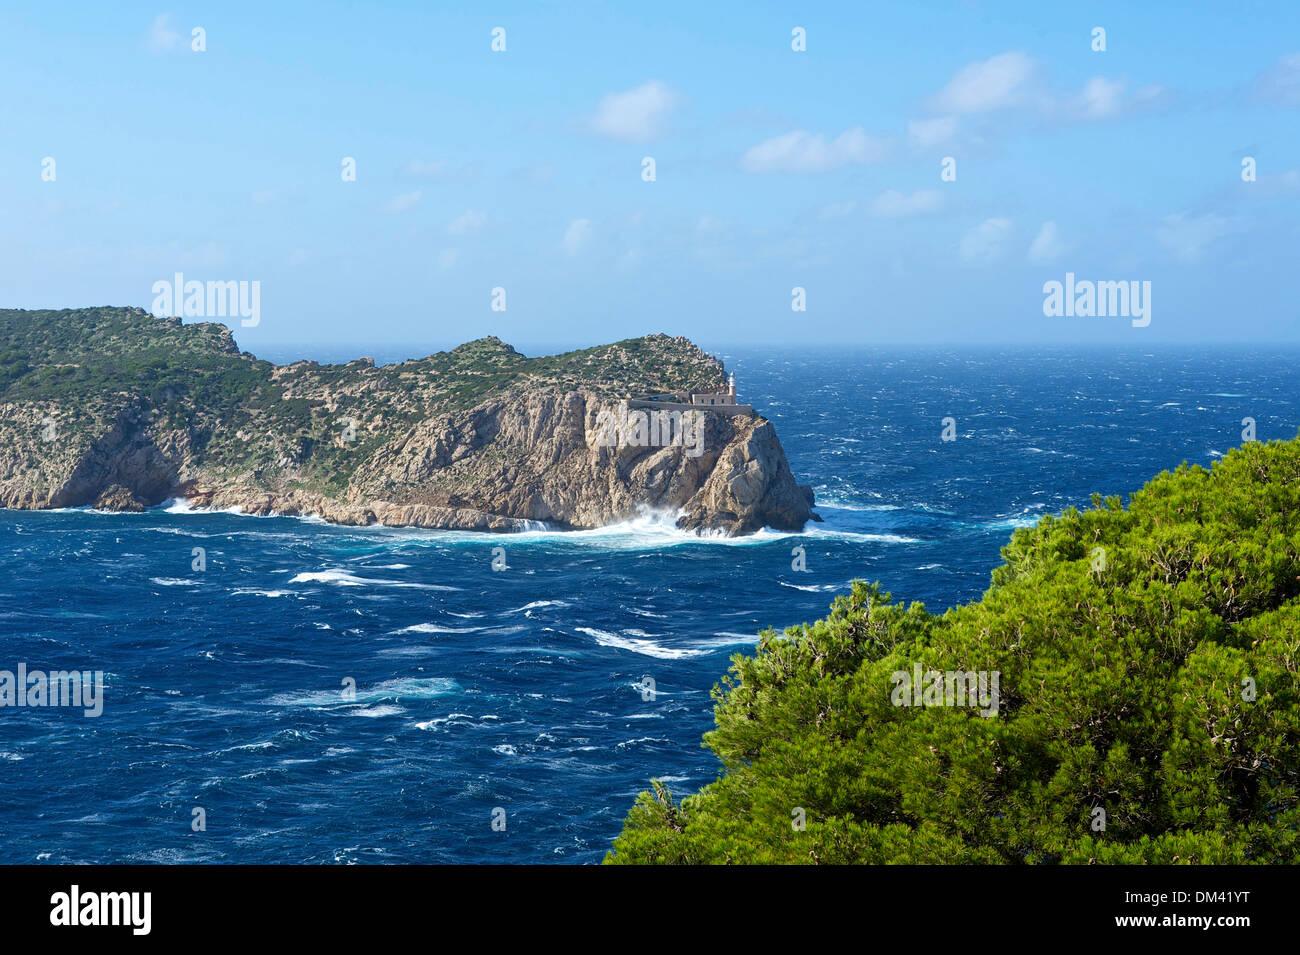 Balearic Islands Majorca Spain Europe Sa Dragonera island scenery landscape coast nature Mediterranean Sea sea outside nobody - Stock Image